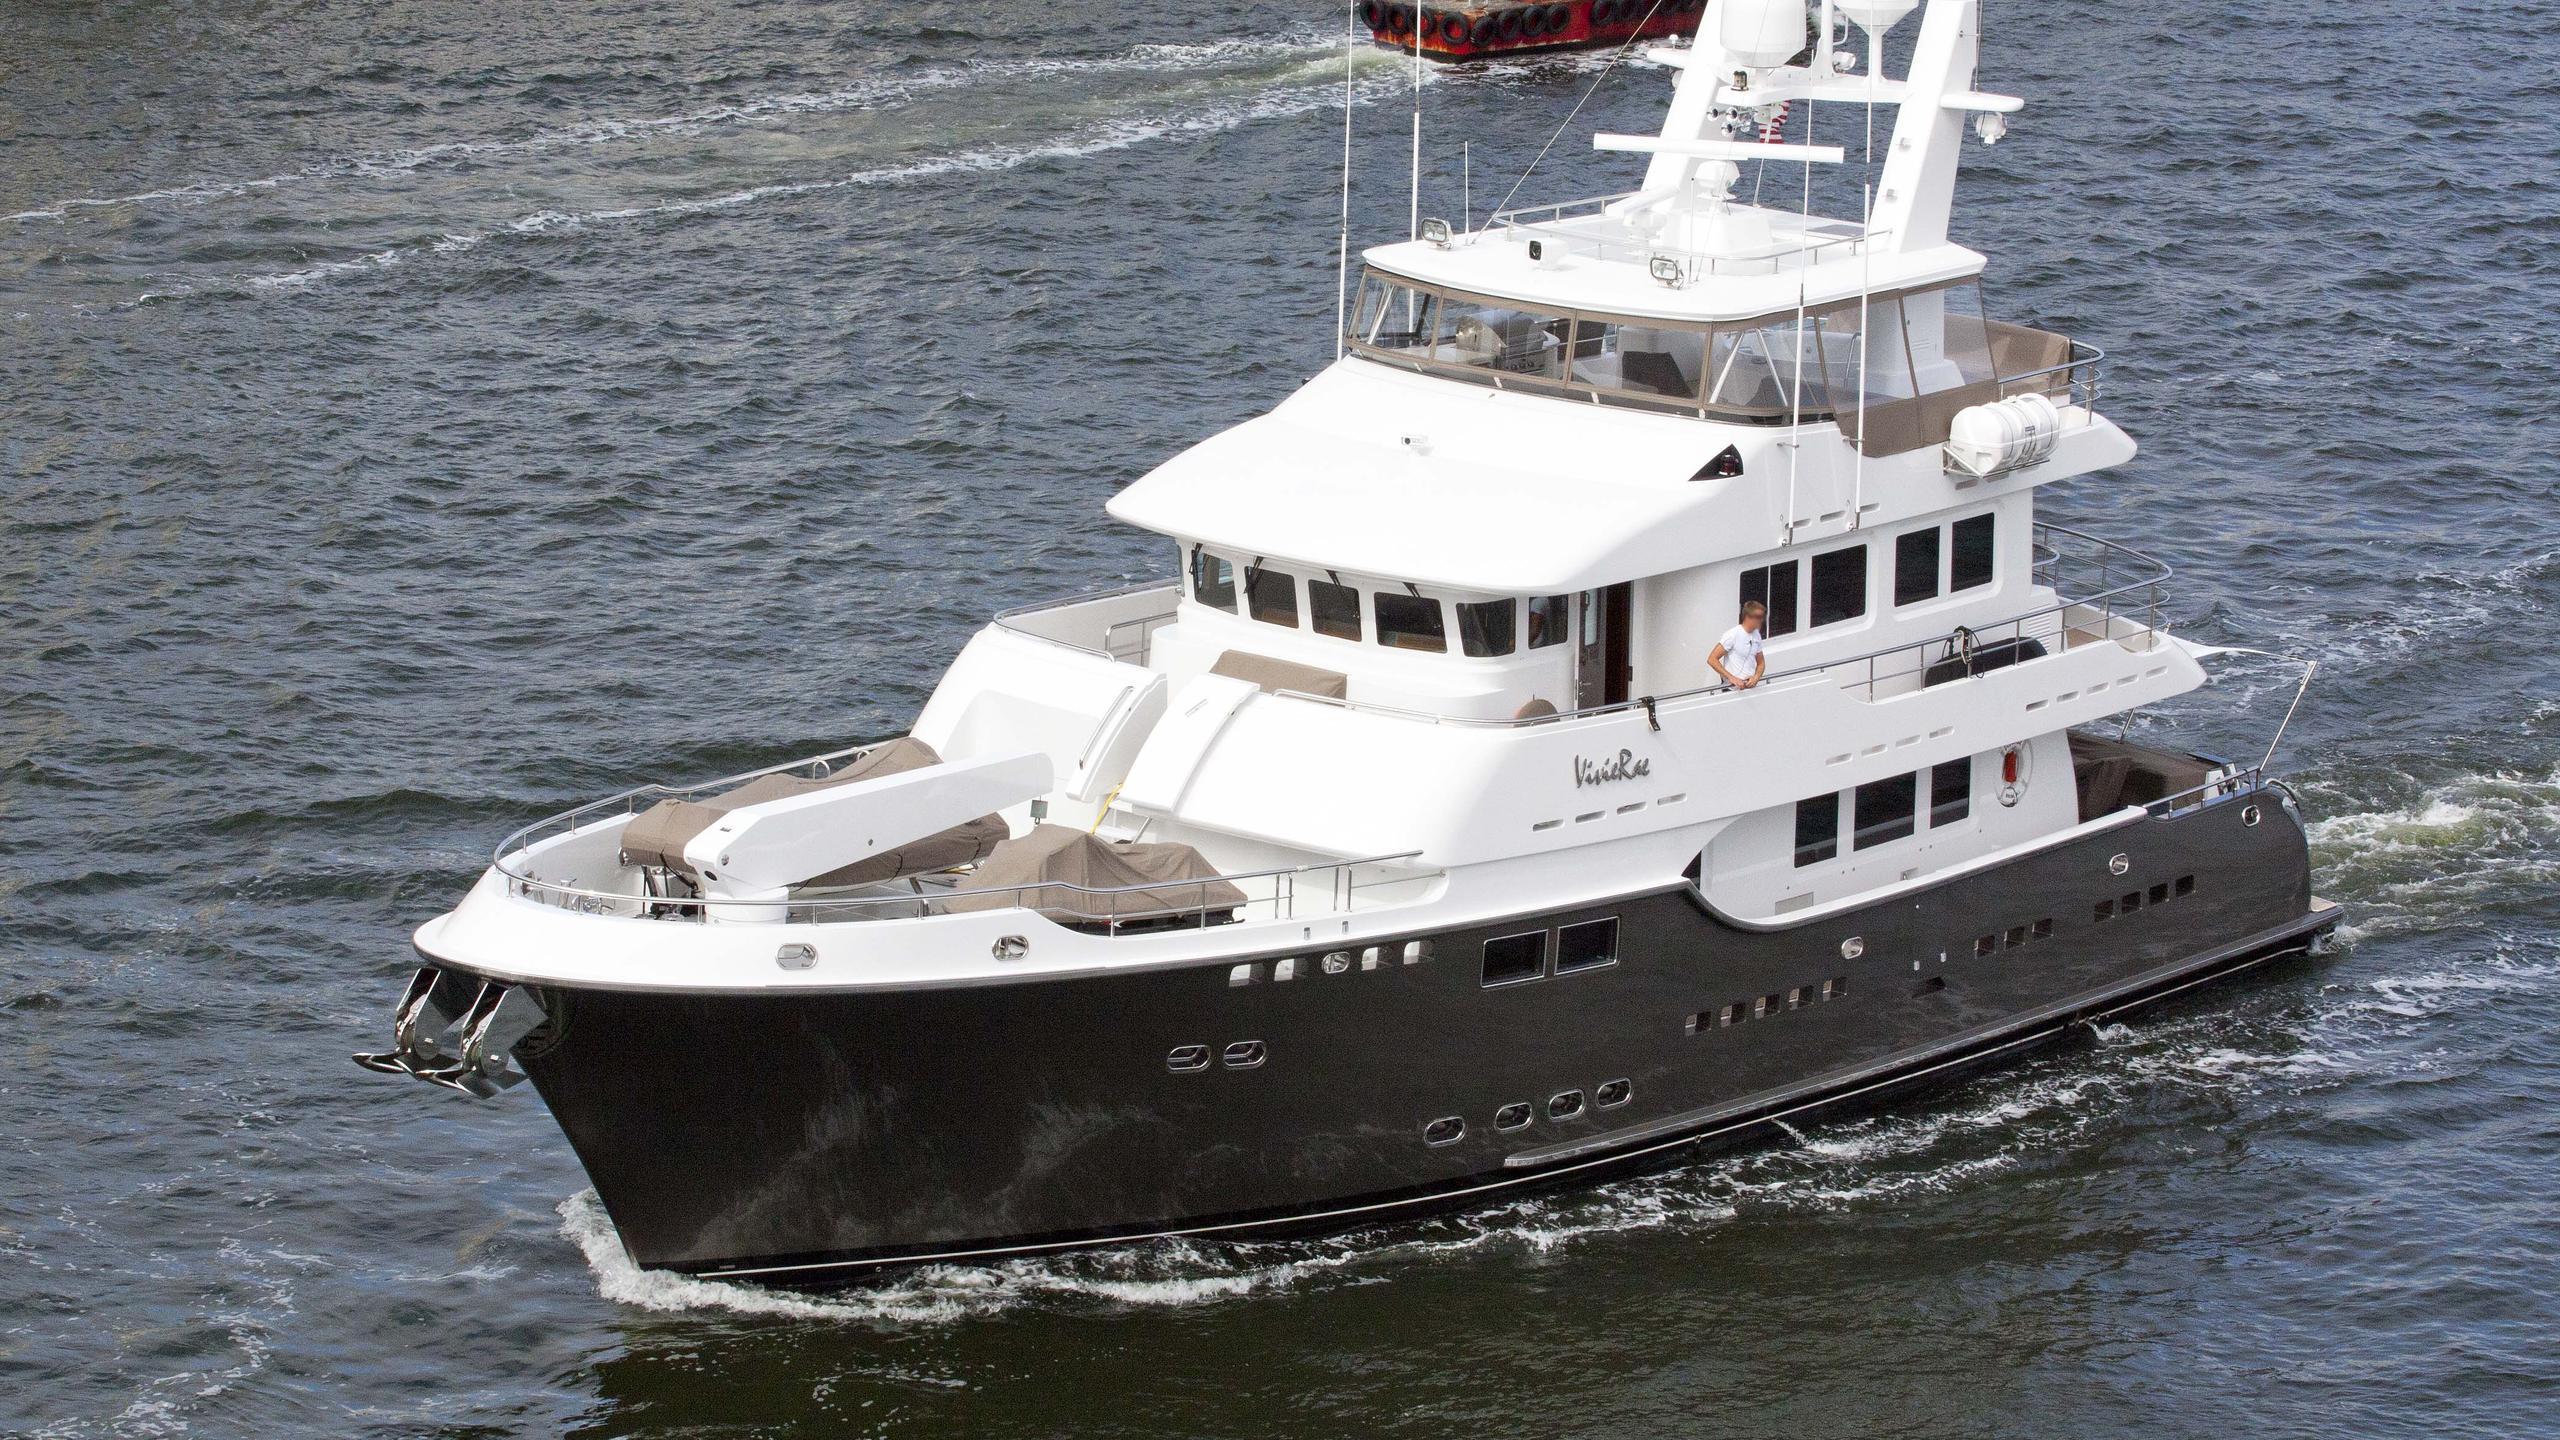 vivirae explorer yacht nordhavn 2007 27m half profile